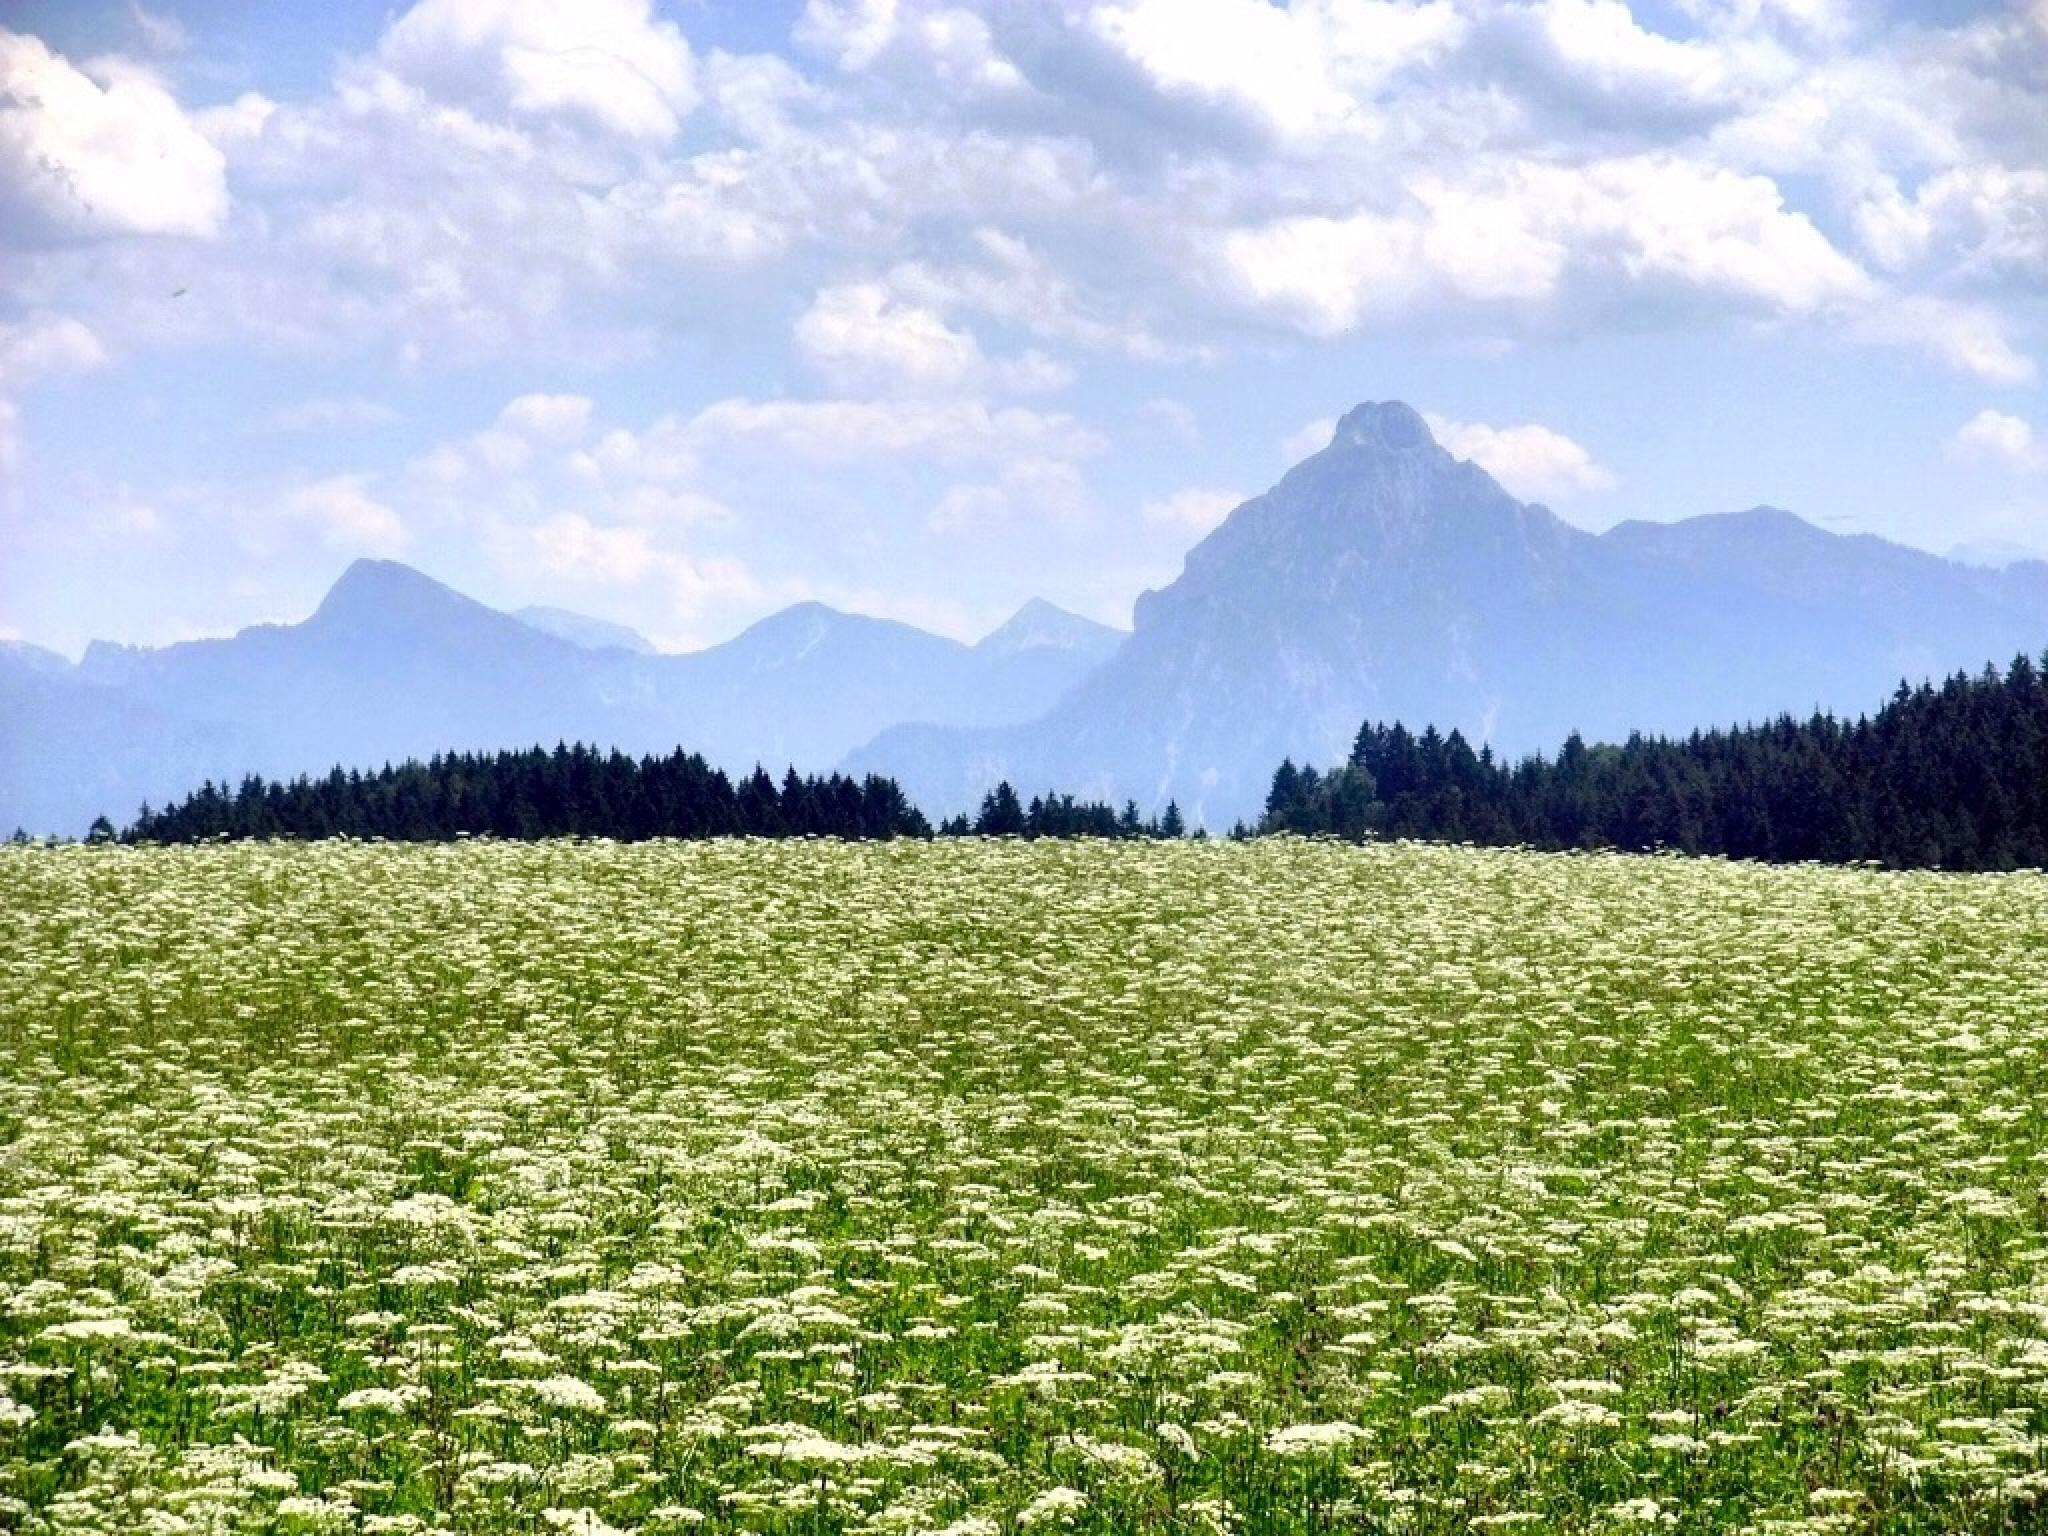 Alp by Detlef F. Rimkus